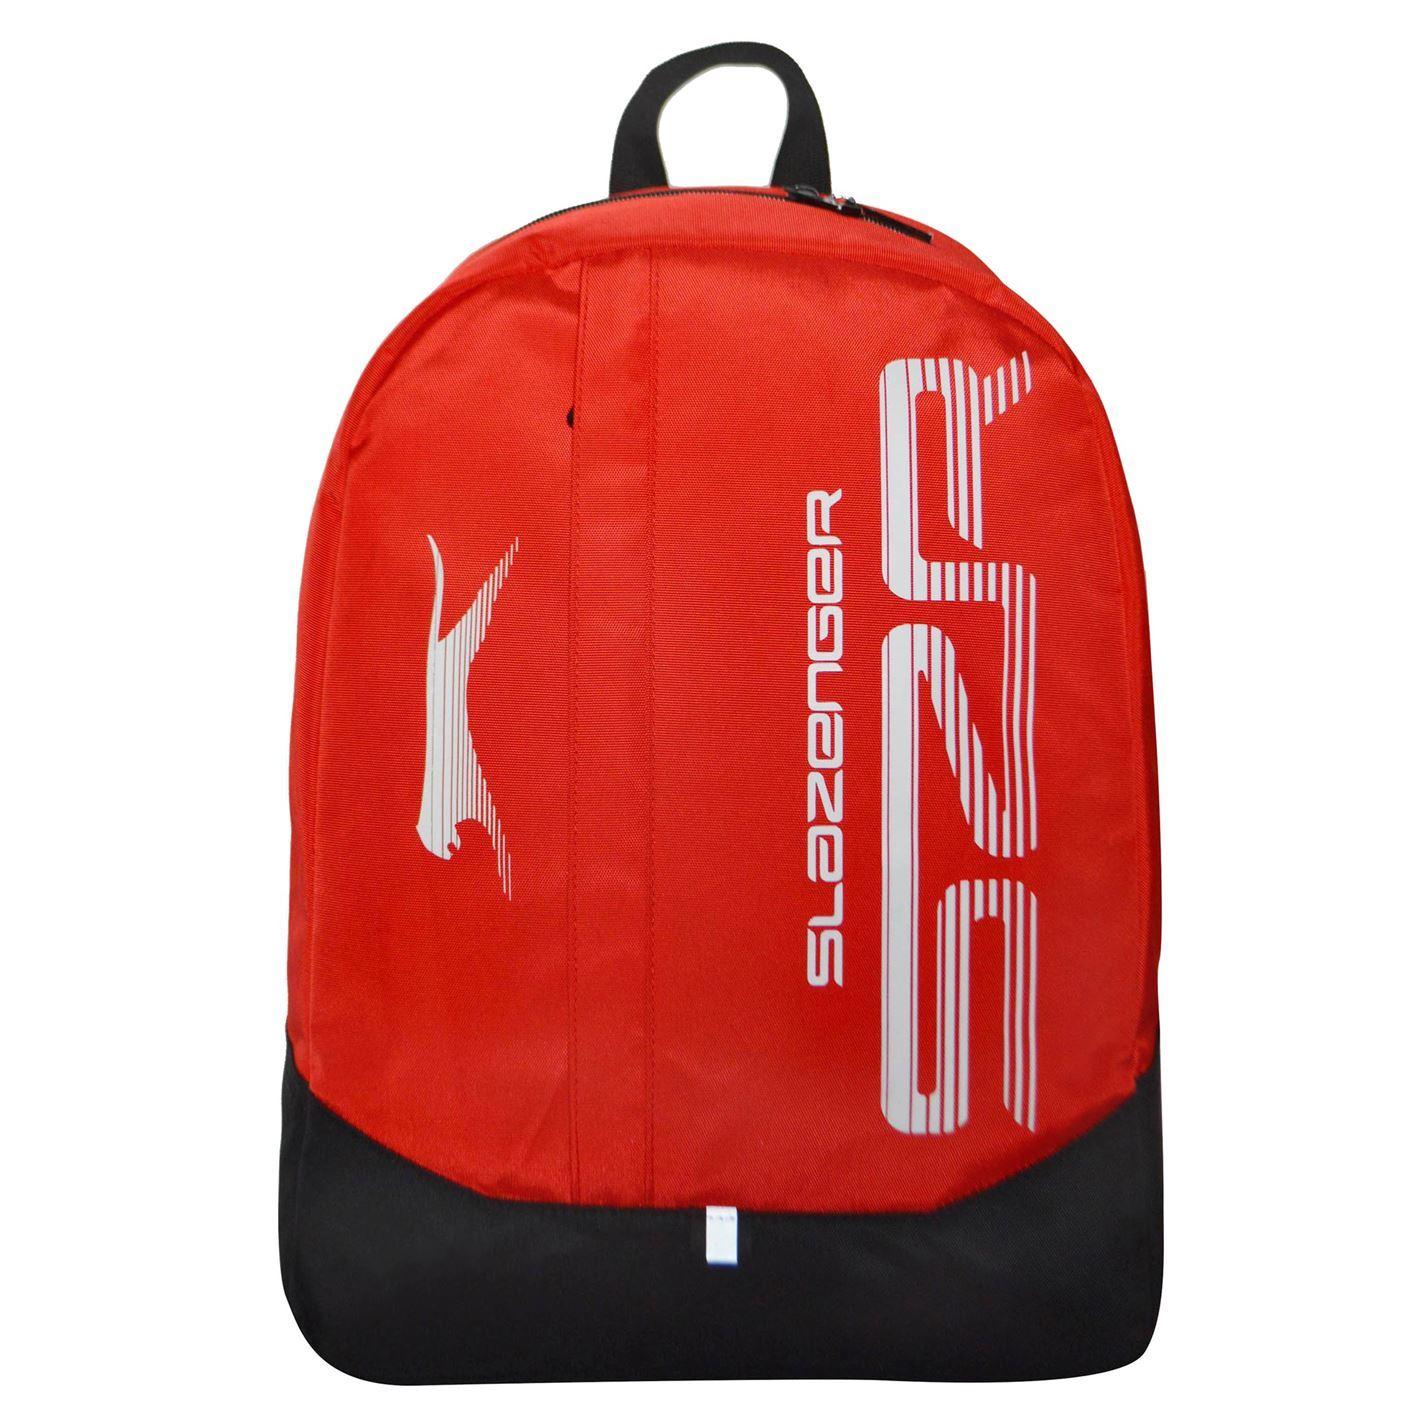 Slazenger Large Logo Backpack Red Black Rucksack Sports Bag Gymbag Kitbag